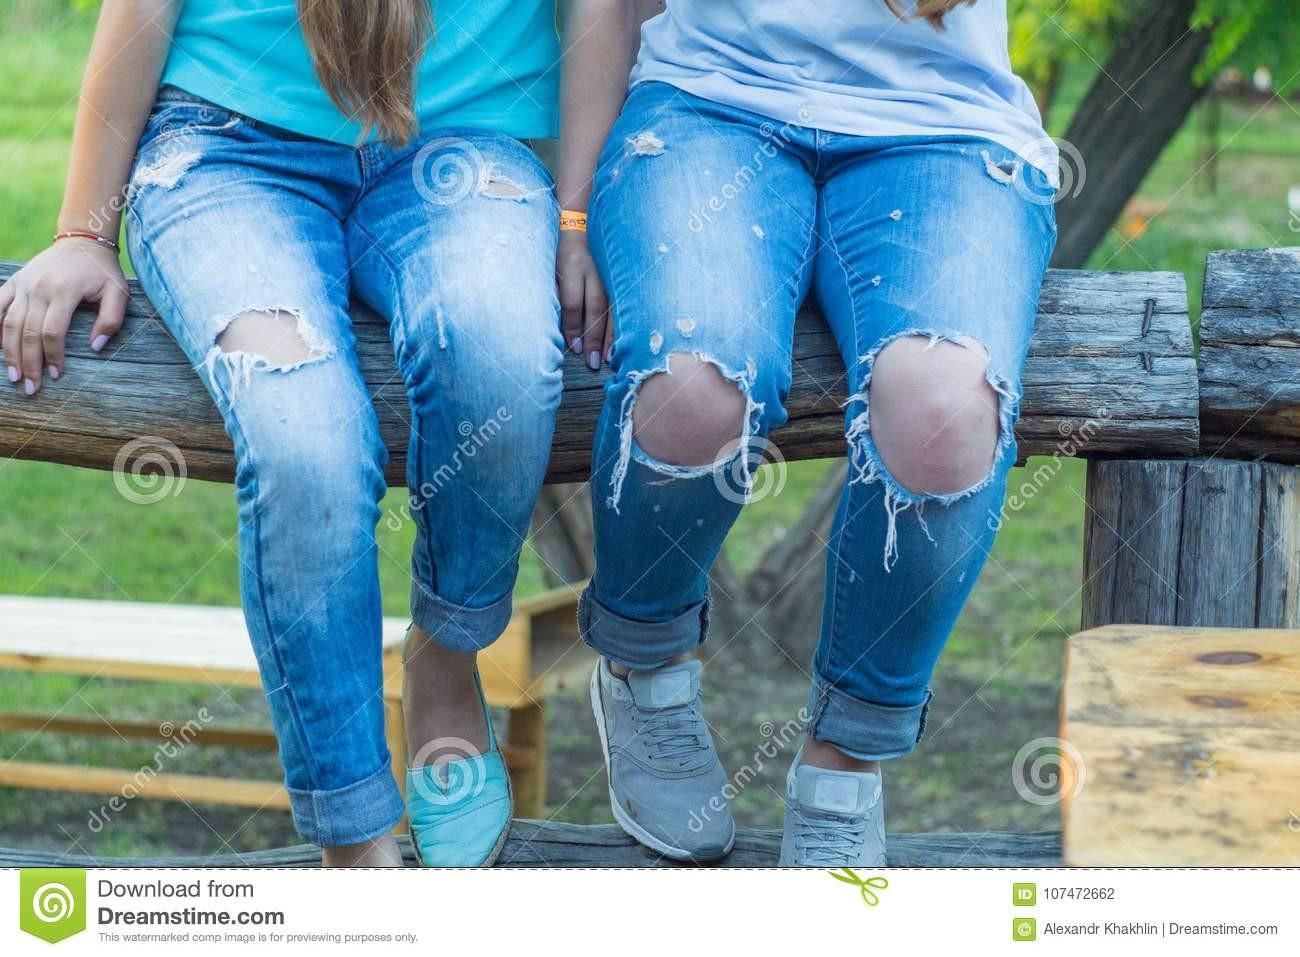 Mon pantalon est décousu, si ça continue, on verra l'trou d'ma culotte